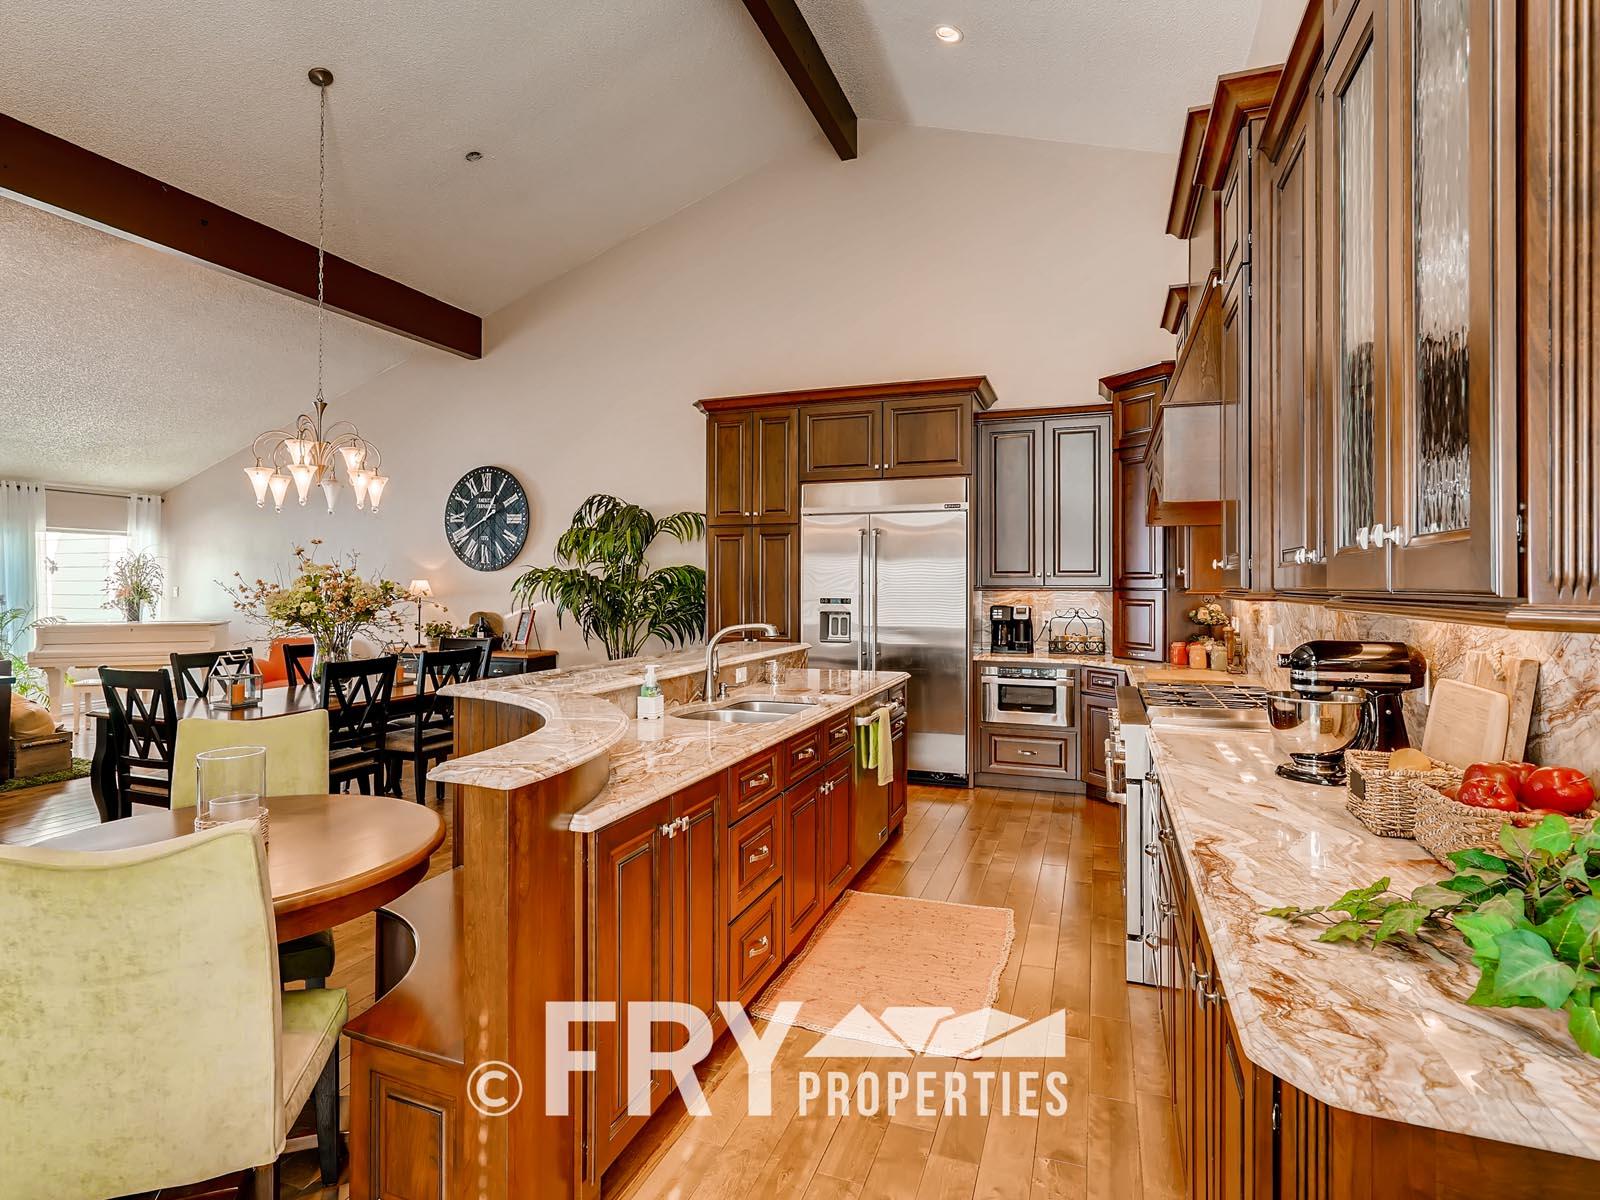 6305 W 6th Ave Unit A6-print-009-10-Kitchen-3600x2398-300dpi